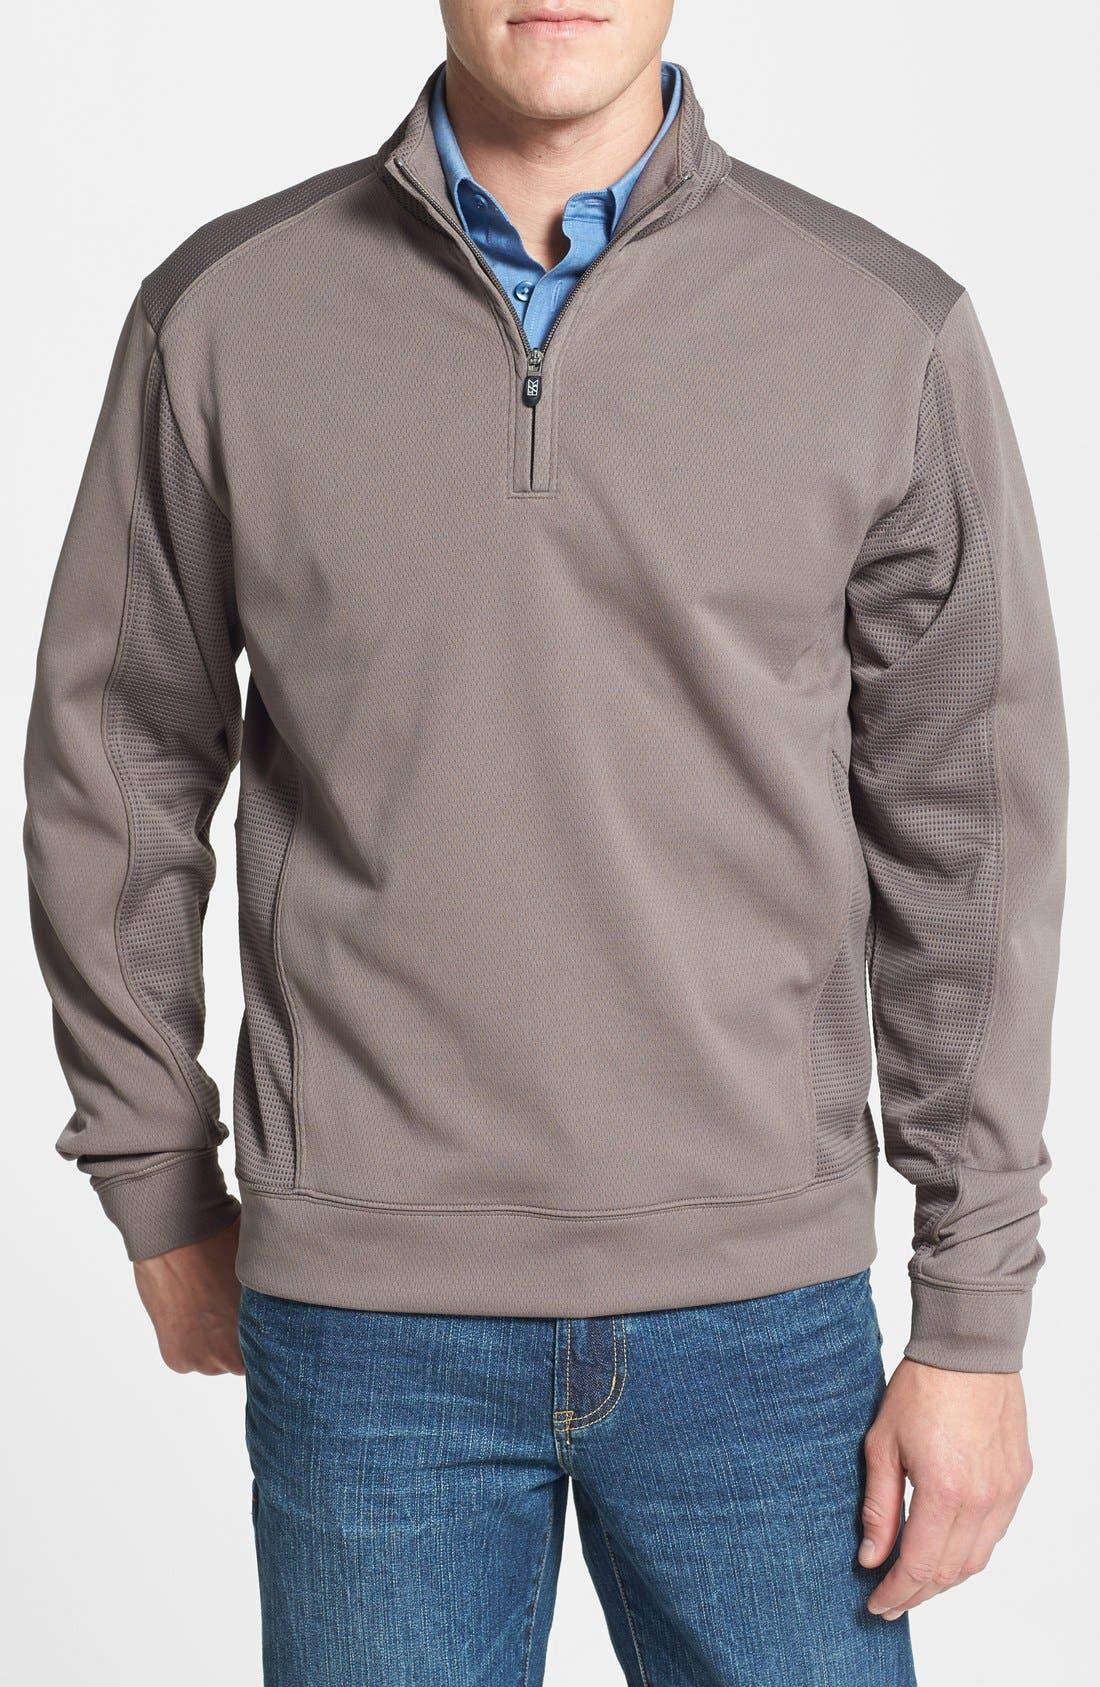 Main Image - Cutter & Buck 'DryTec® Edge' Half Zip Mesh Pullover